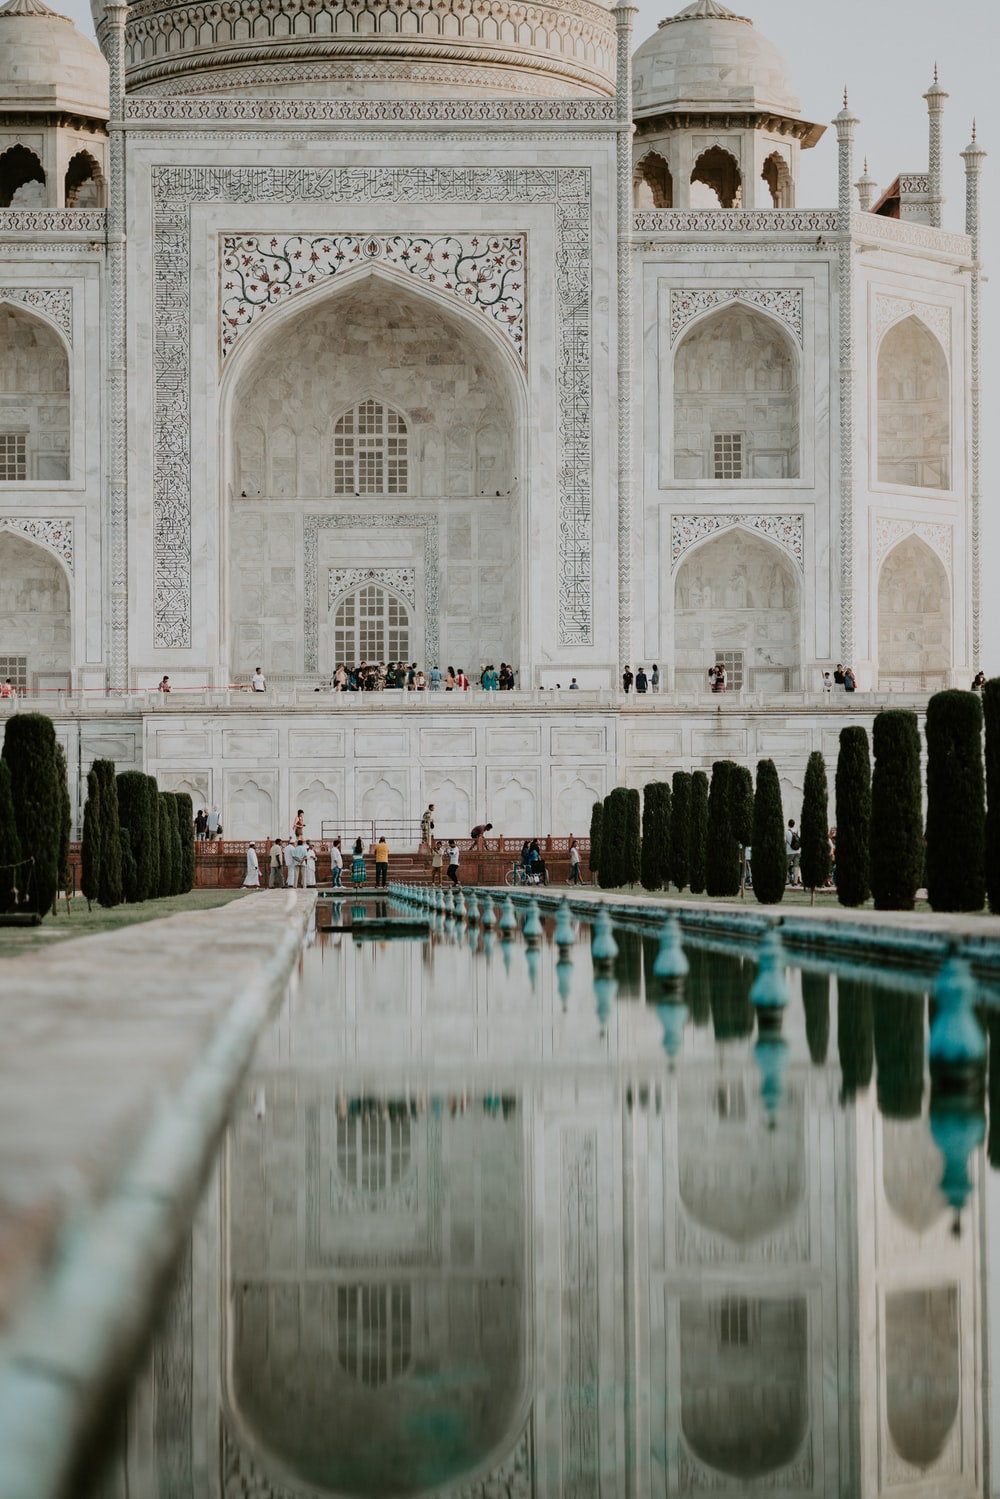 people standing in front of Taj Mahal